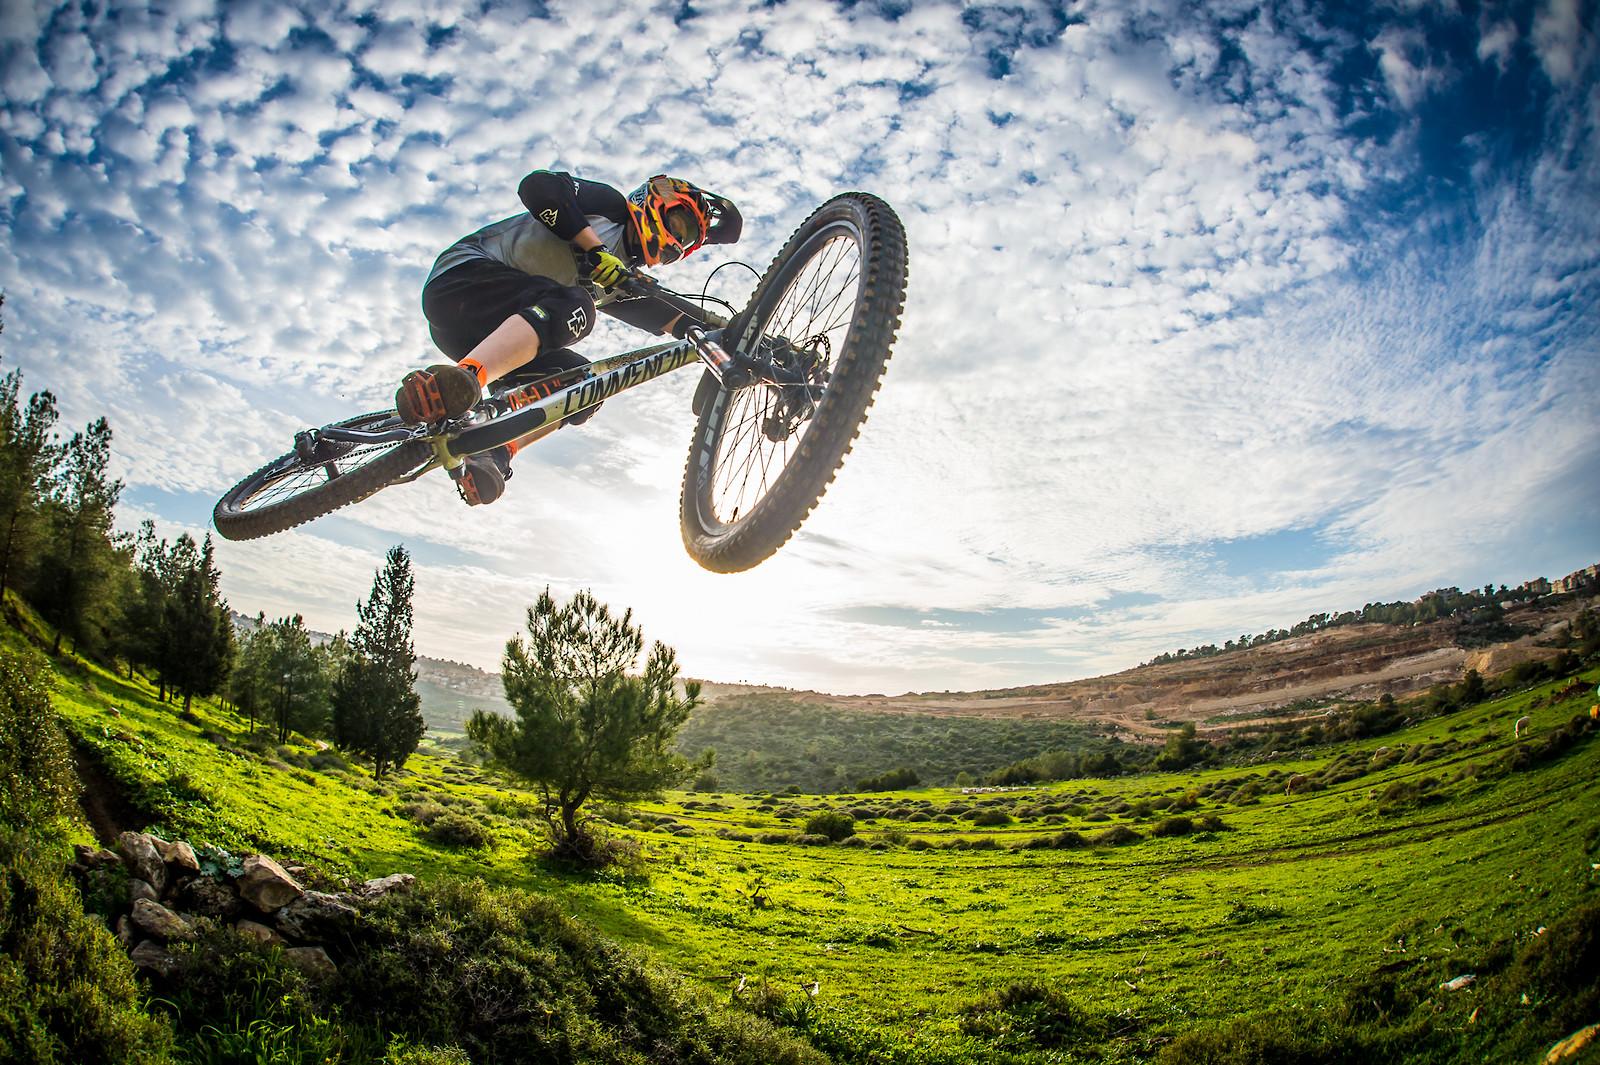 Tabletop - iceman2058 - Mountain Biking Pictures - Vital MTB